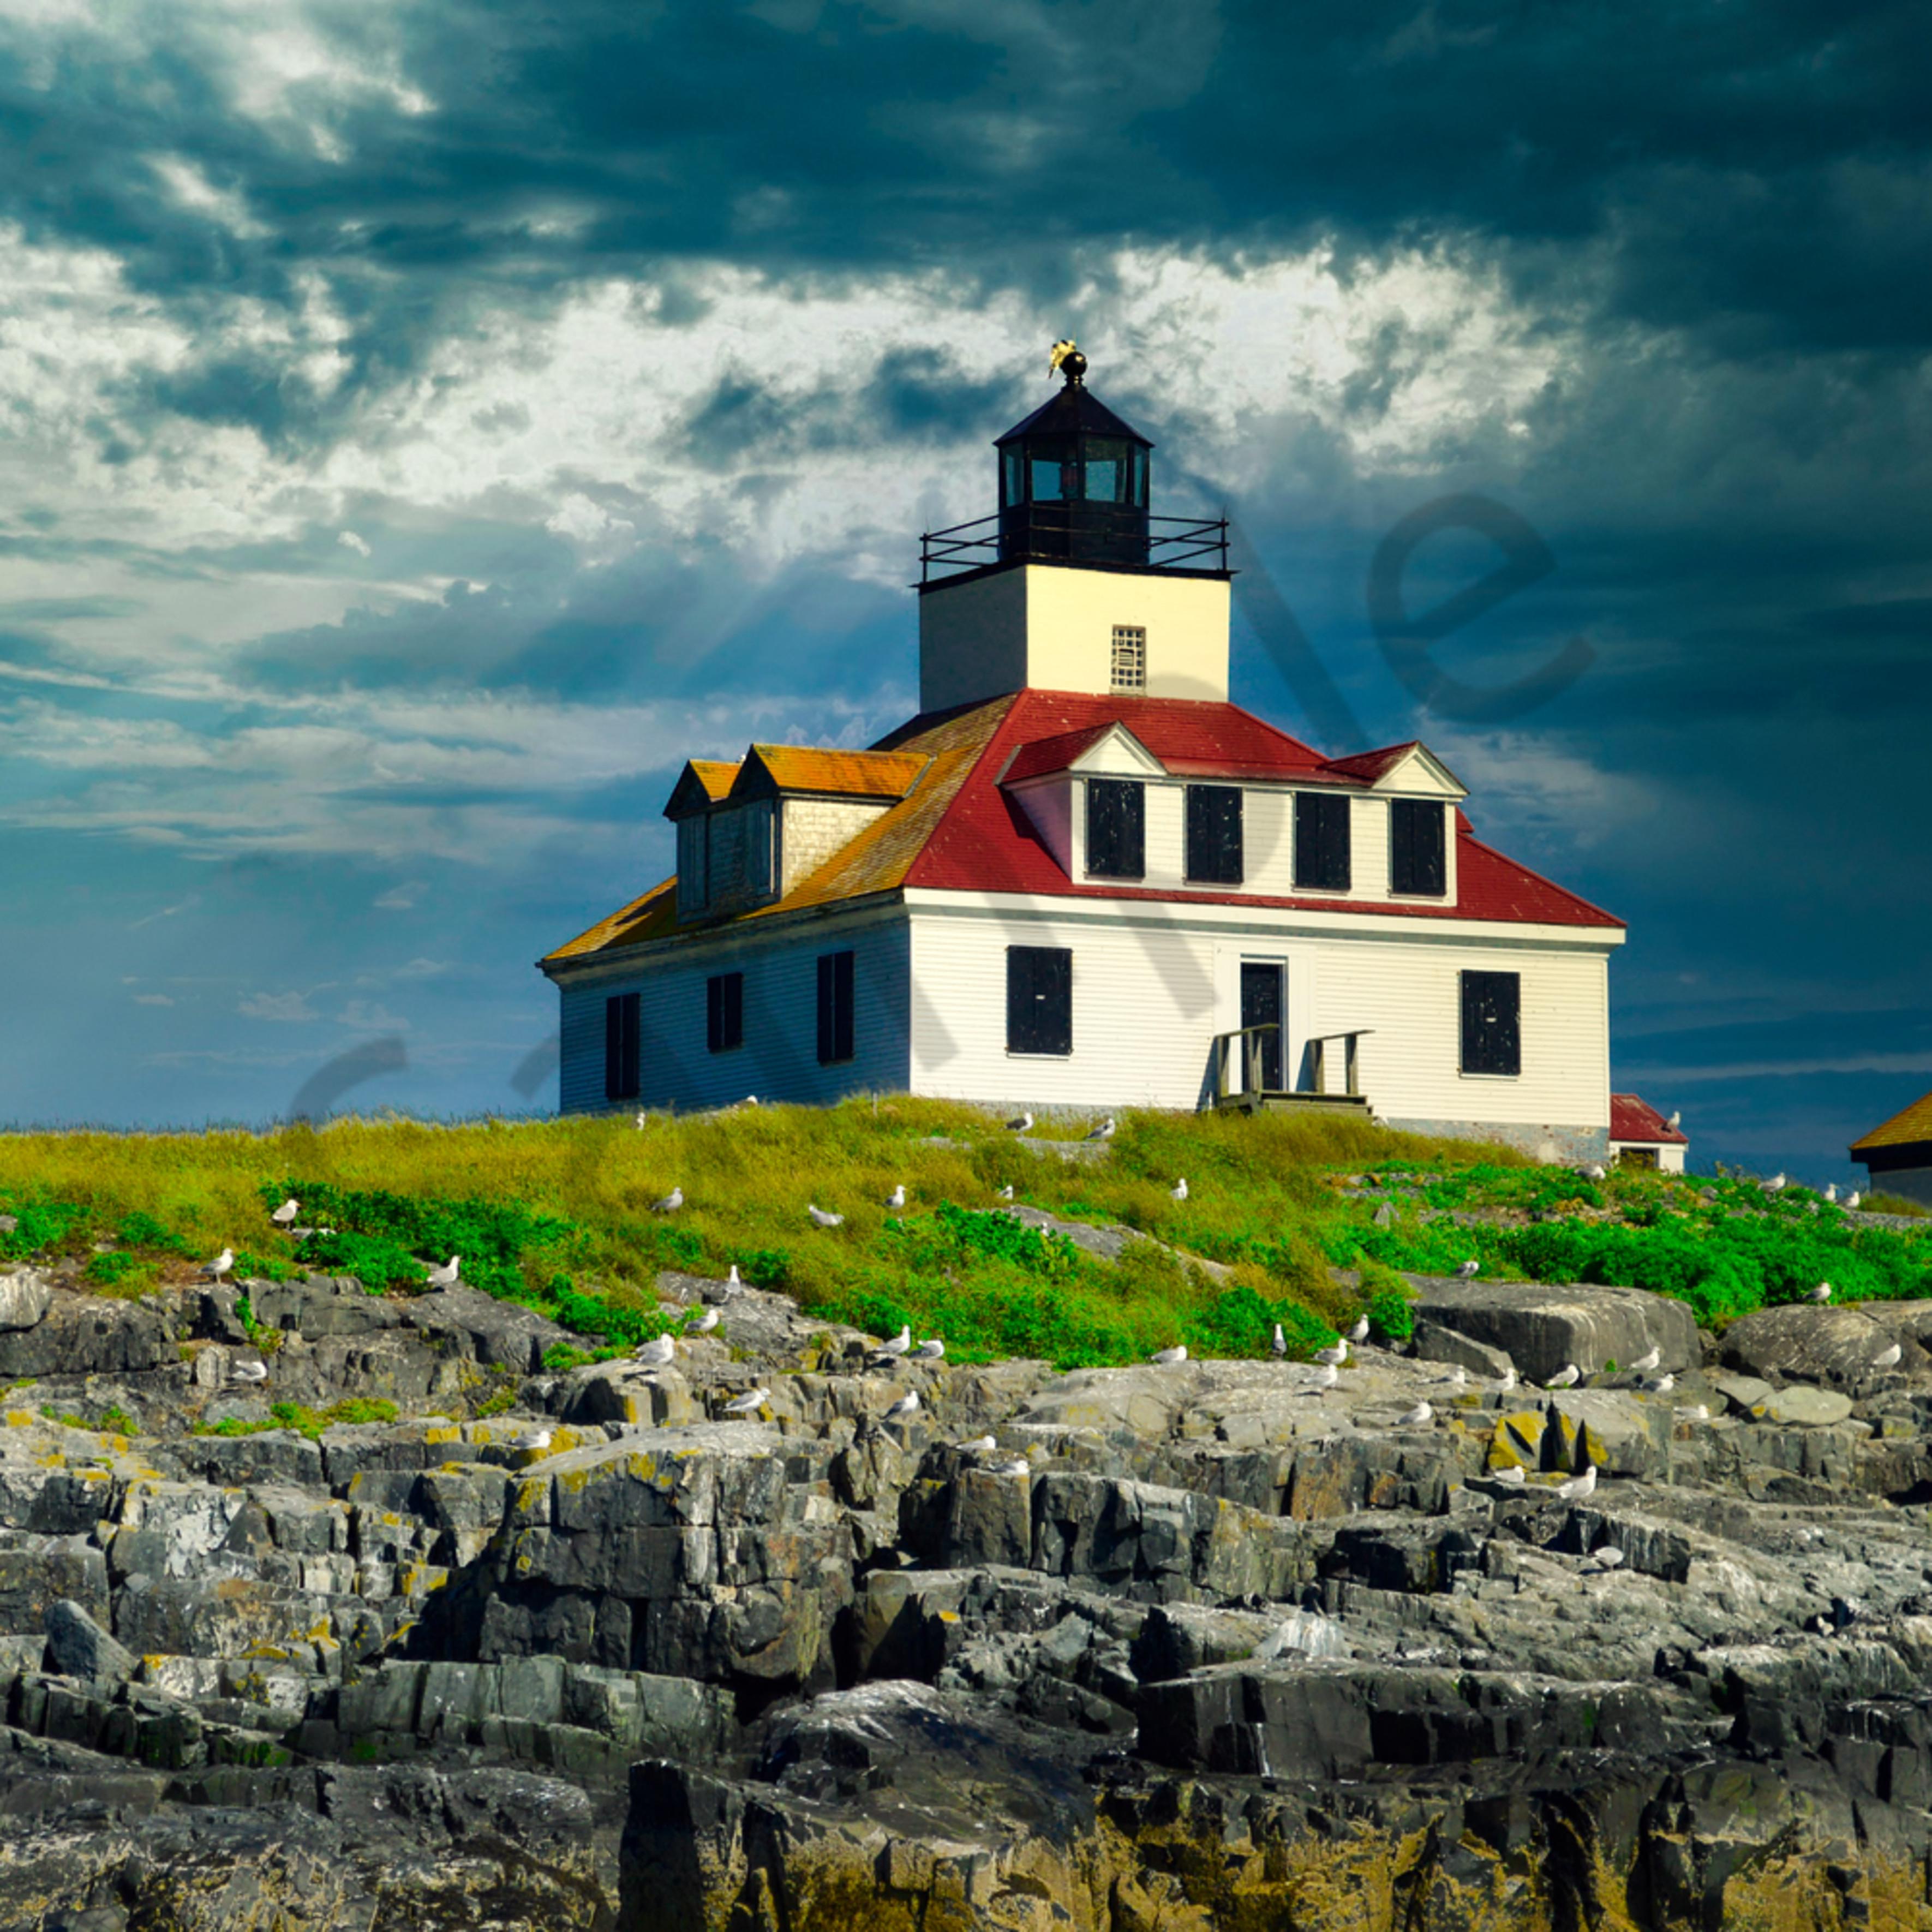 Egg rock lighthouse xrloj6